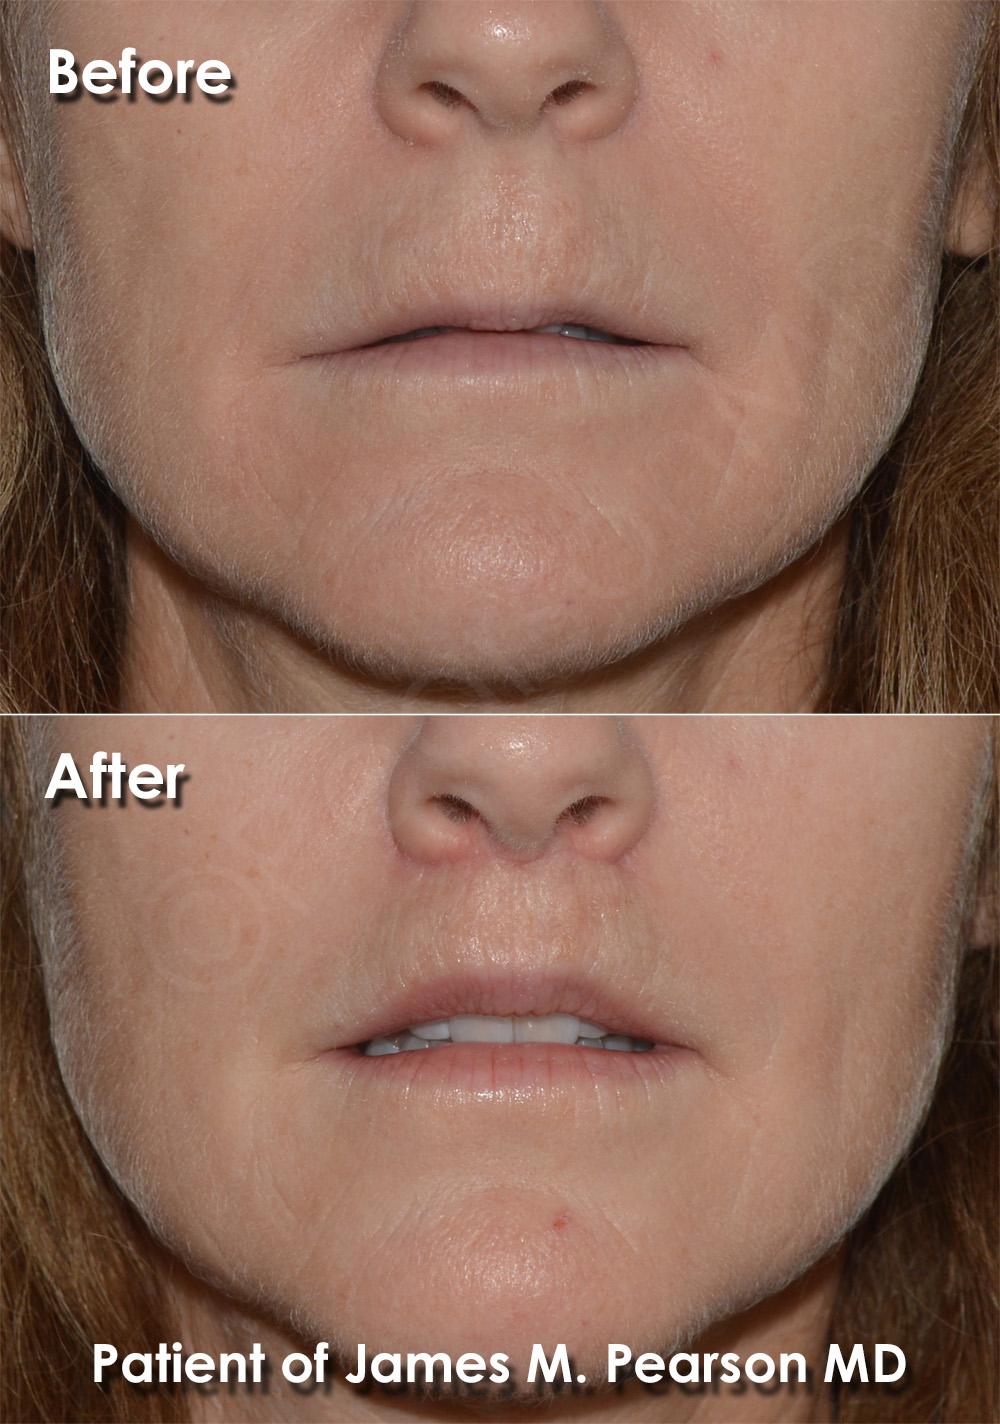 Dr. Pearson Plastic Surgery